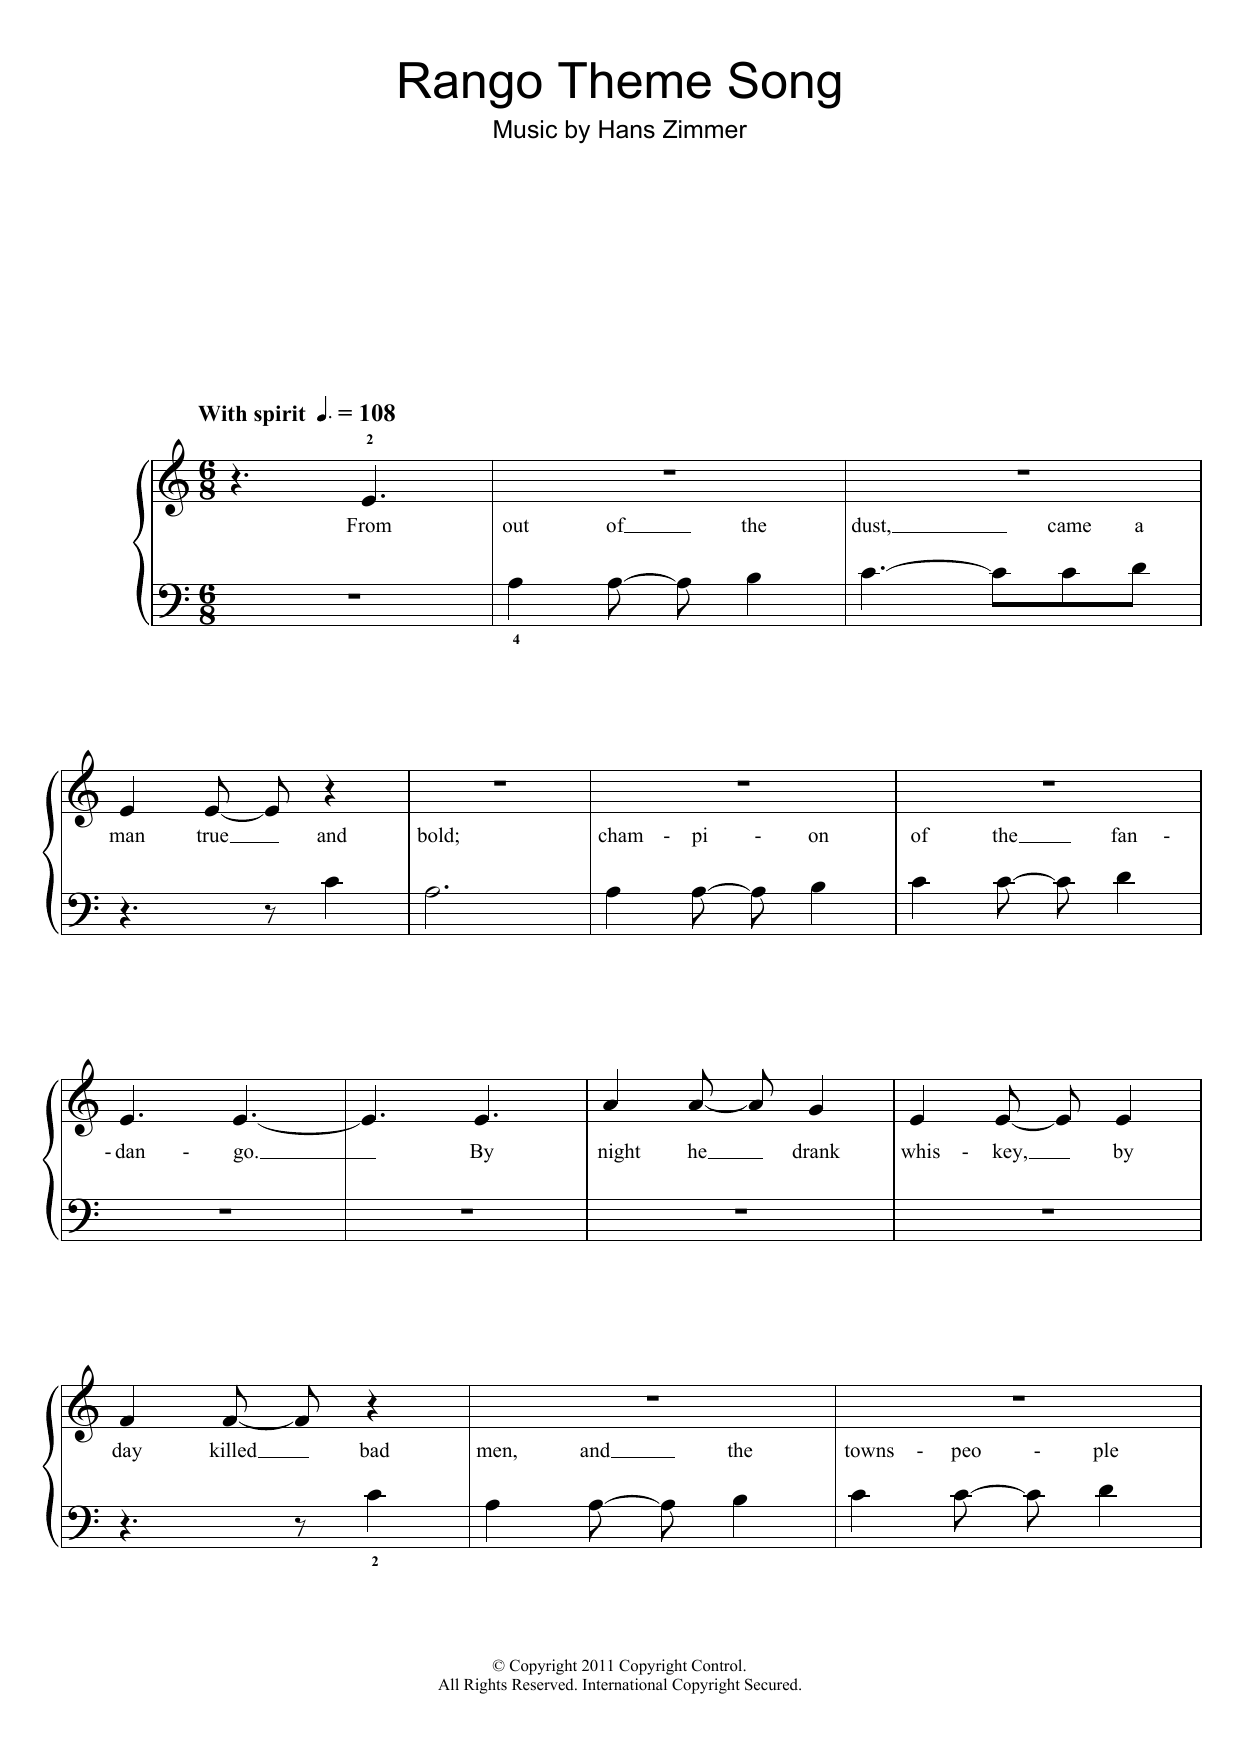 Hans Zimmer - Rango Theme Song